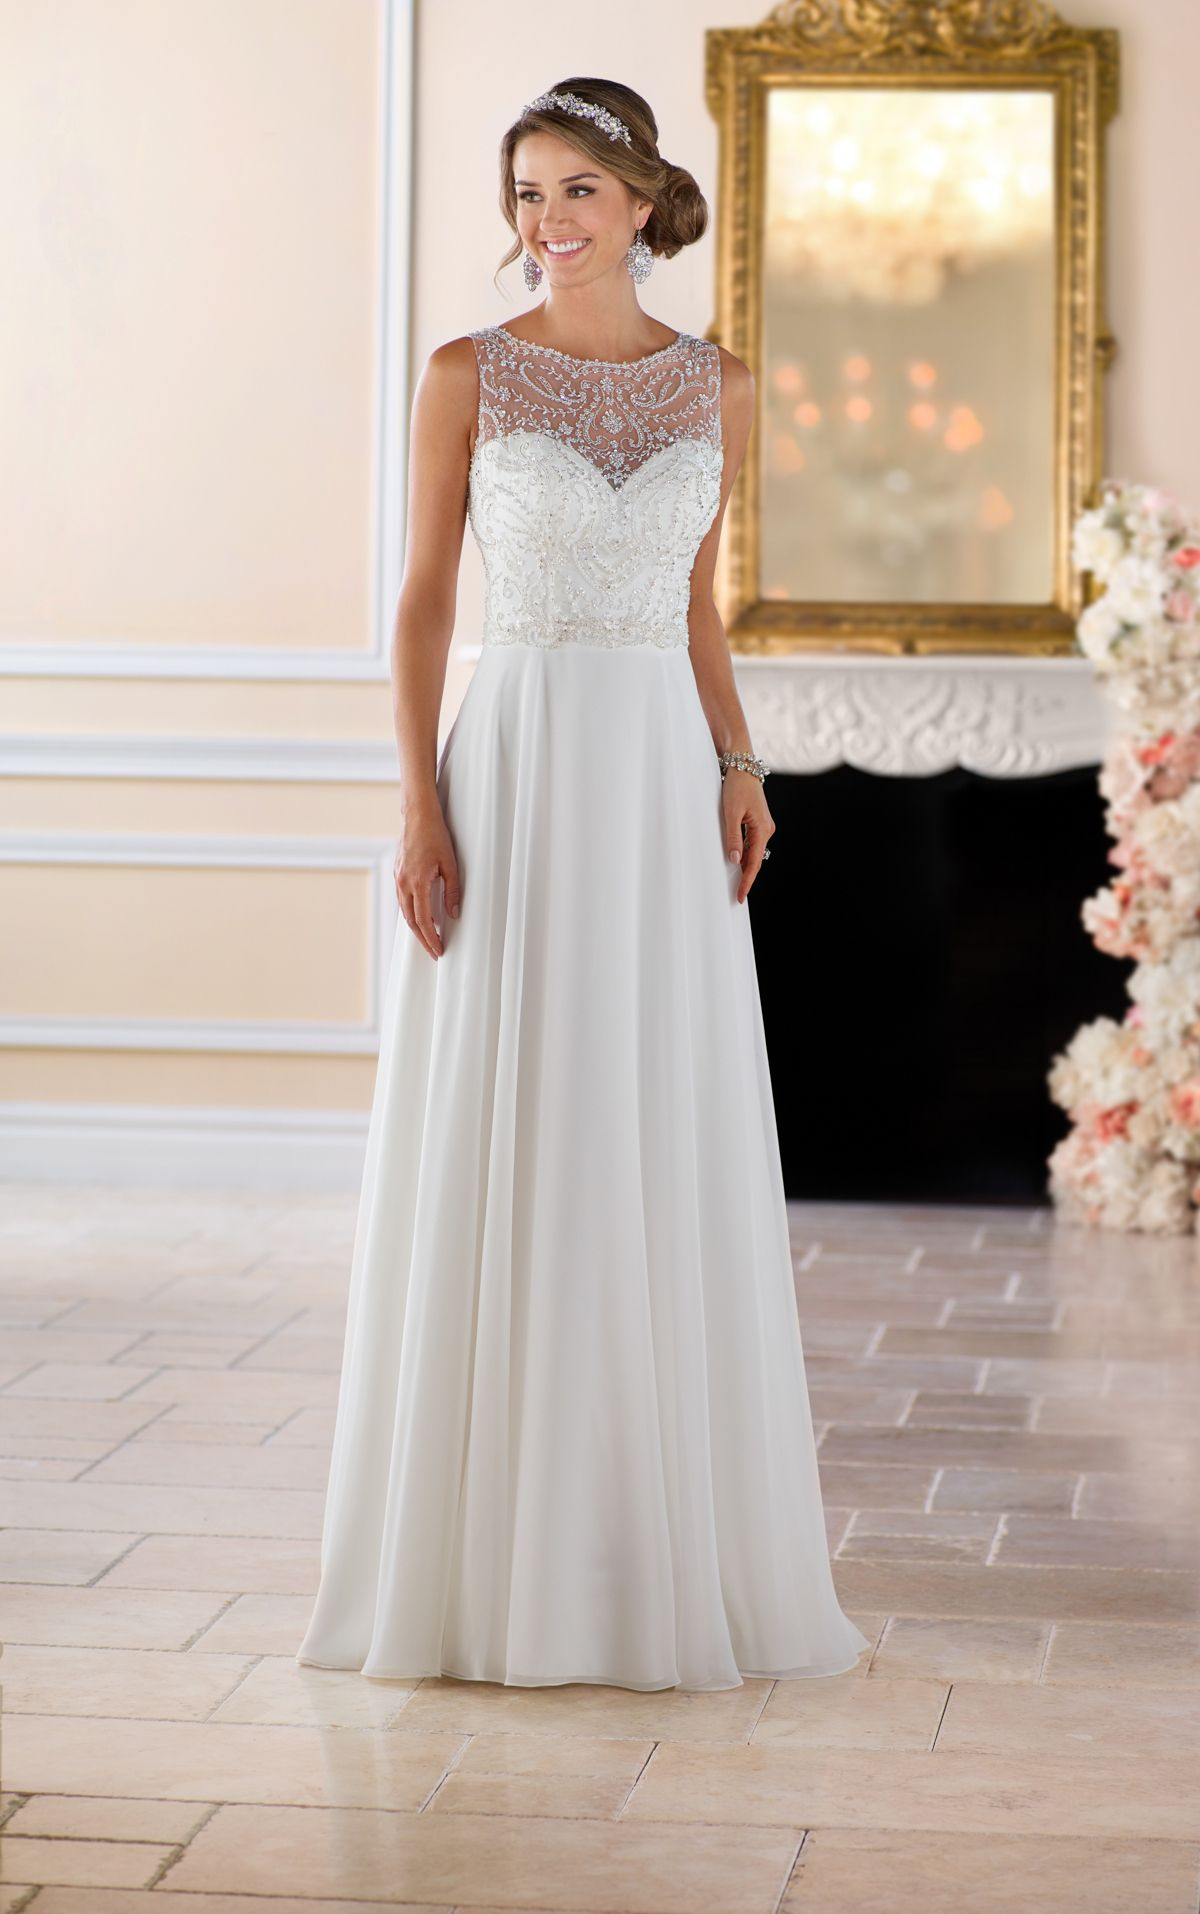 Wedding Dresses  High neck wedding dress, Wedding dress necklines